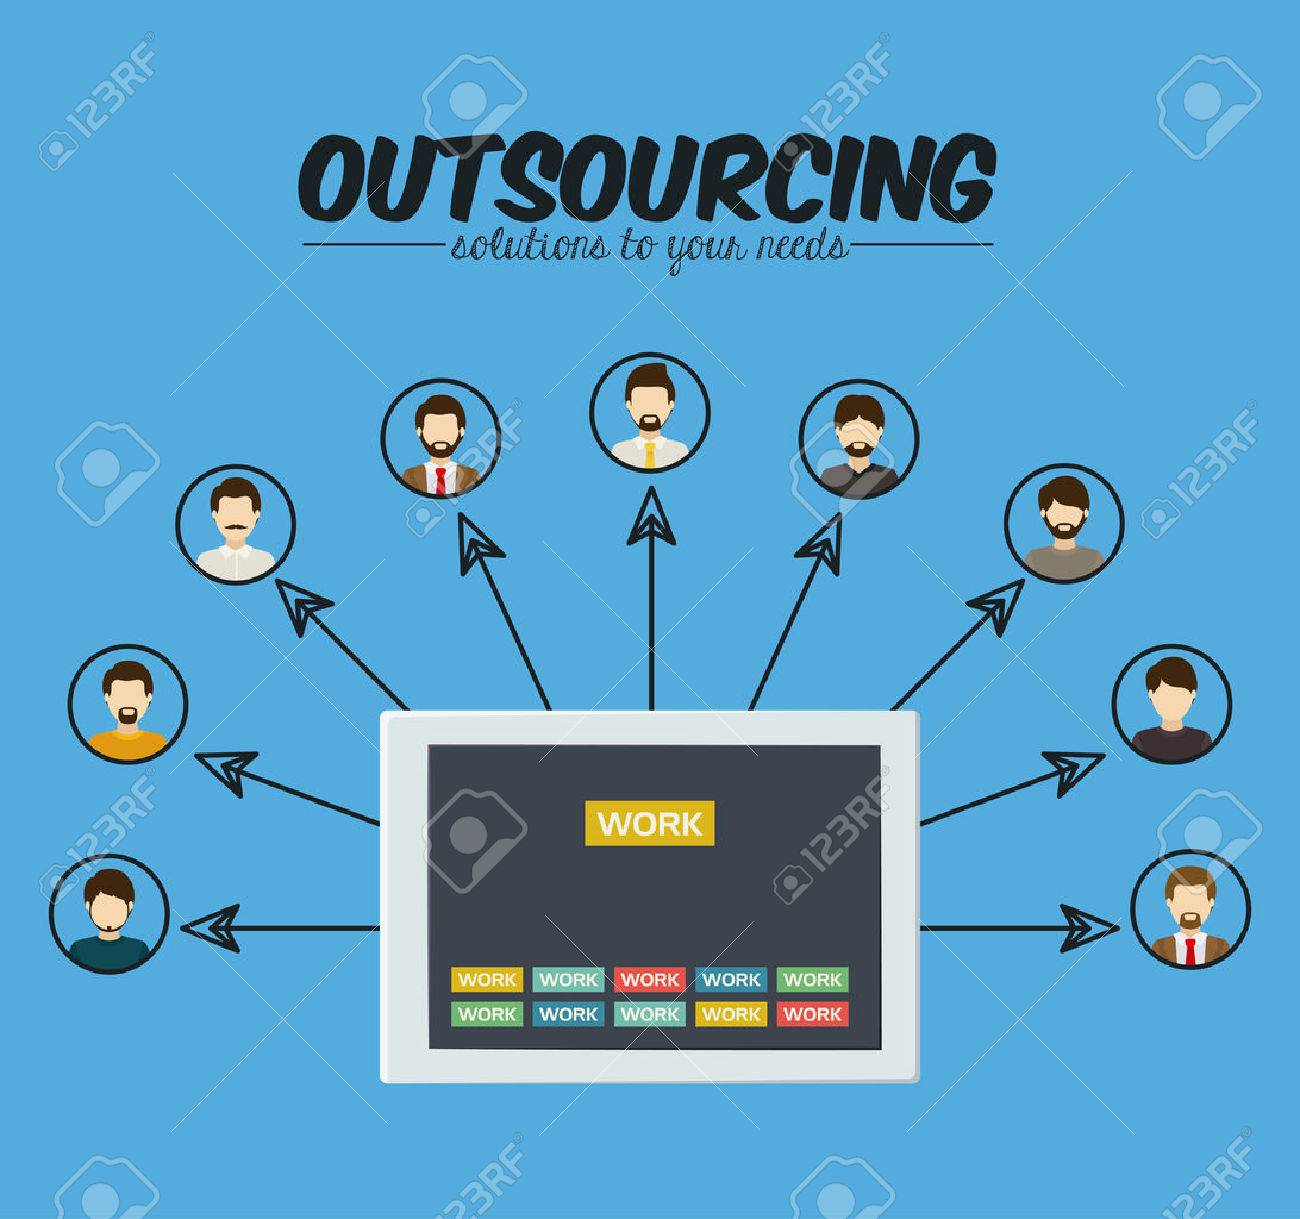 outsourcing digital design vector illustration royalty free